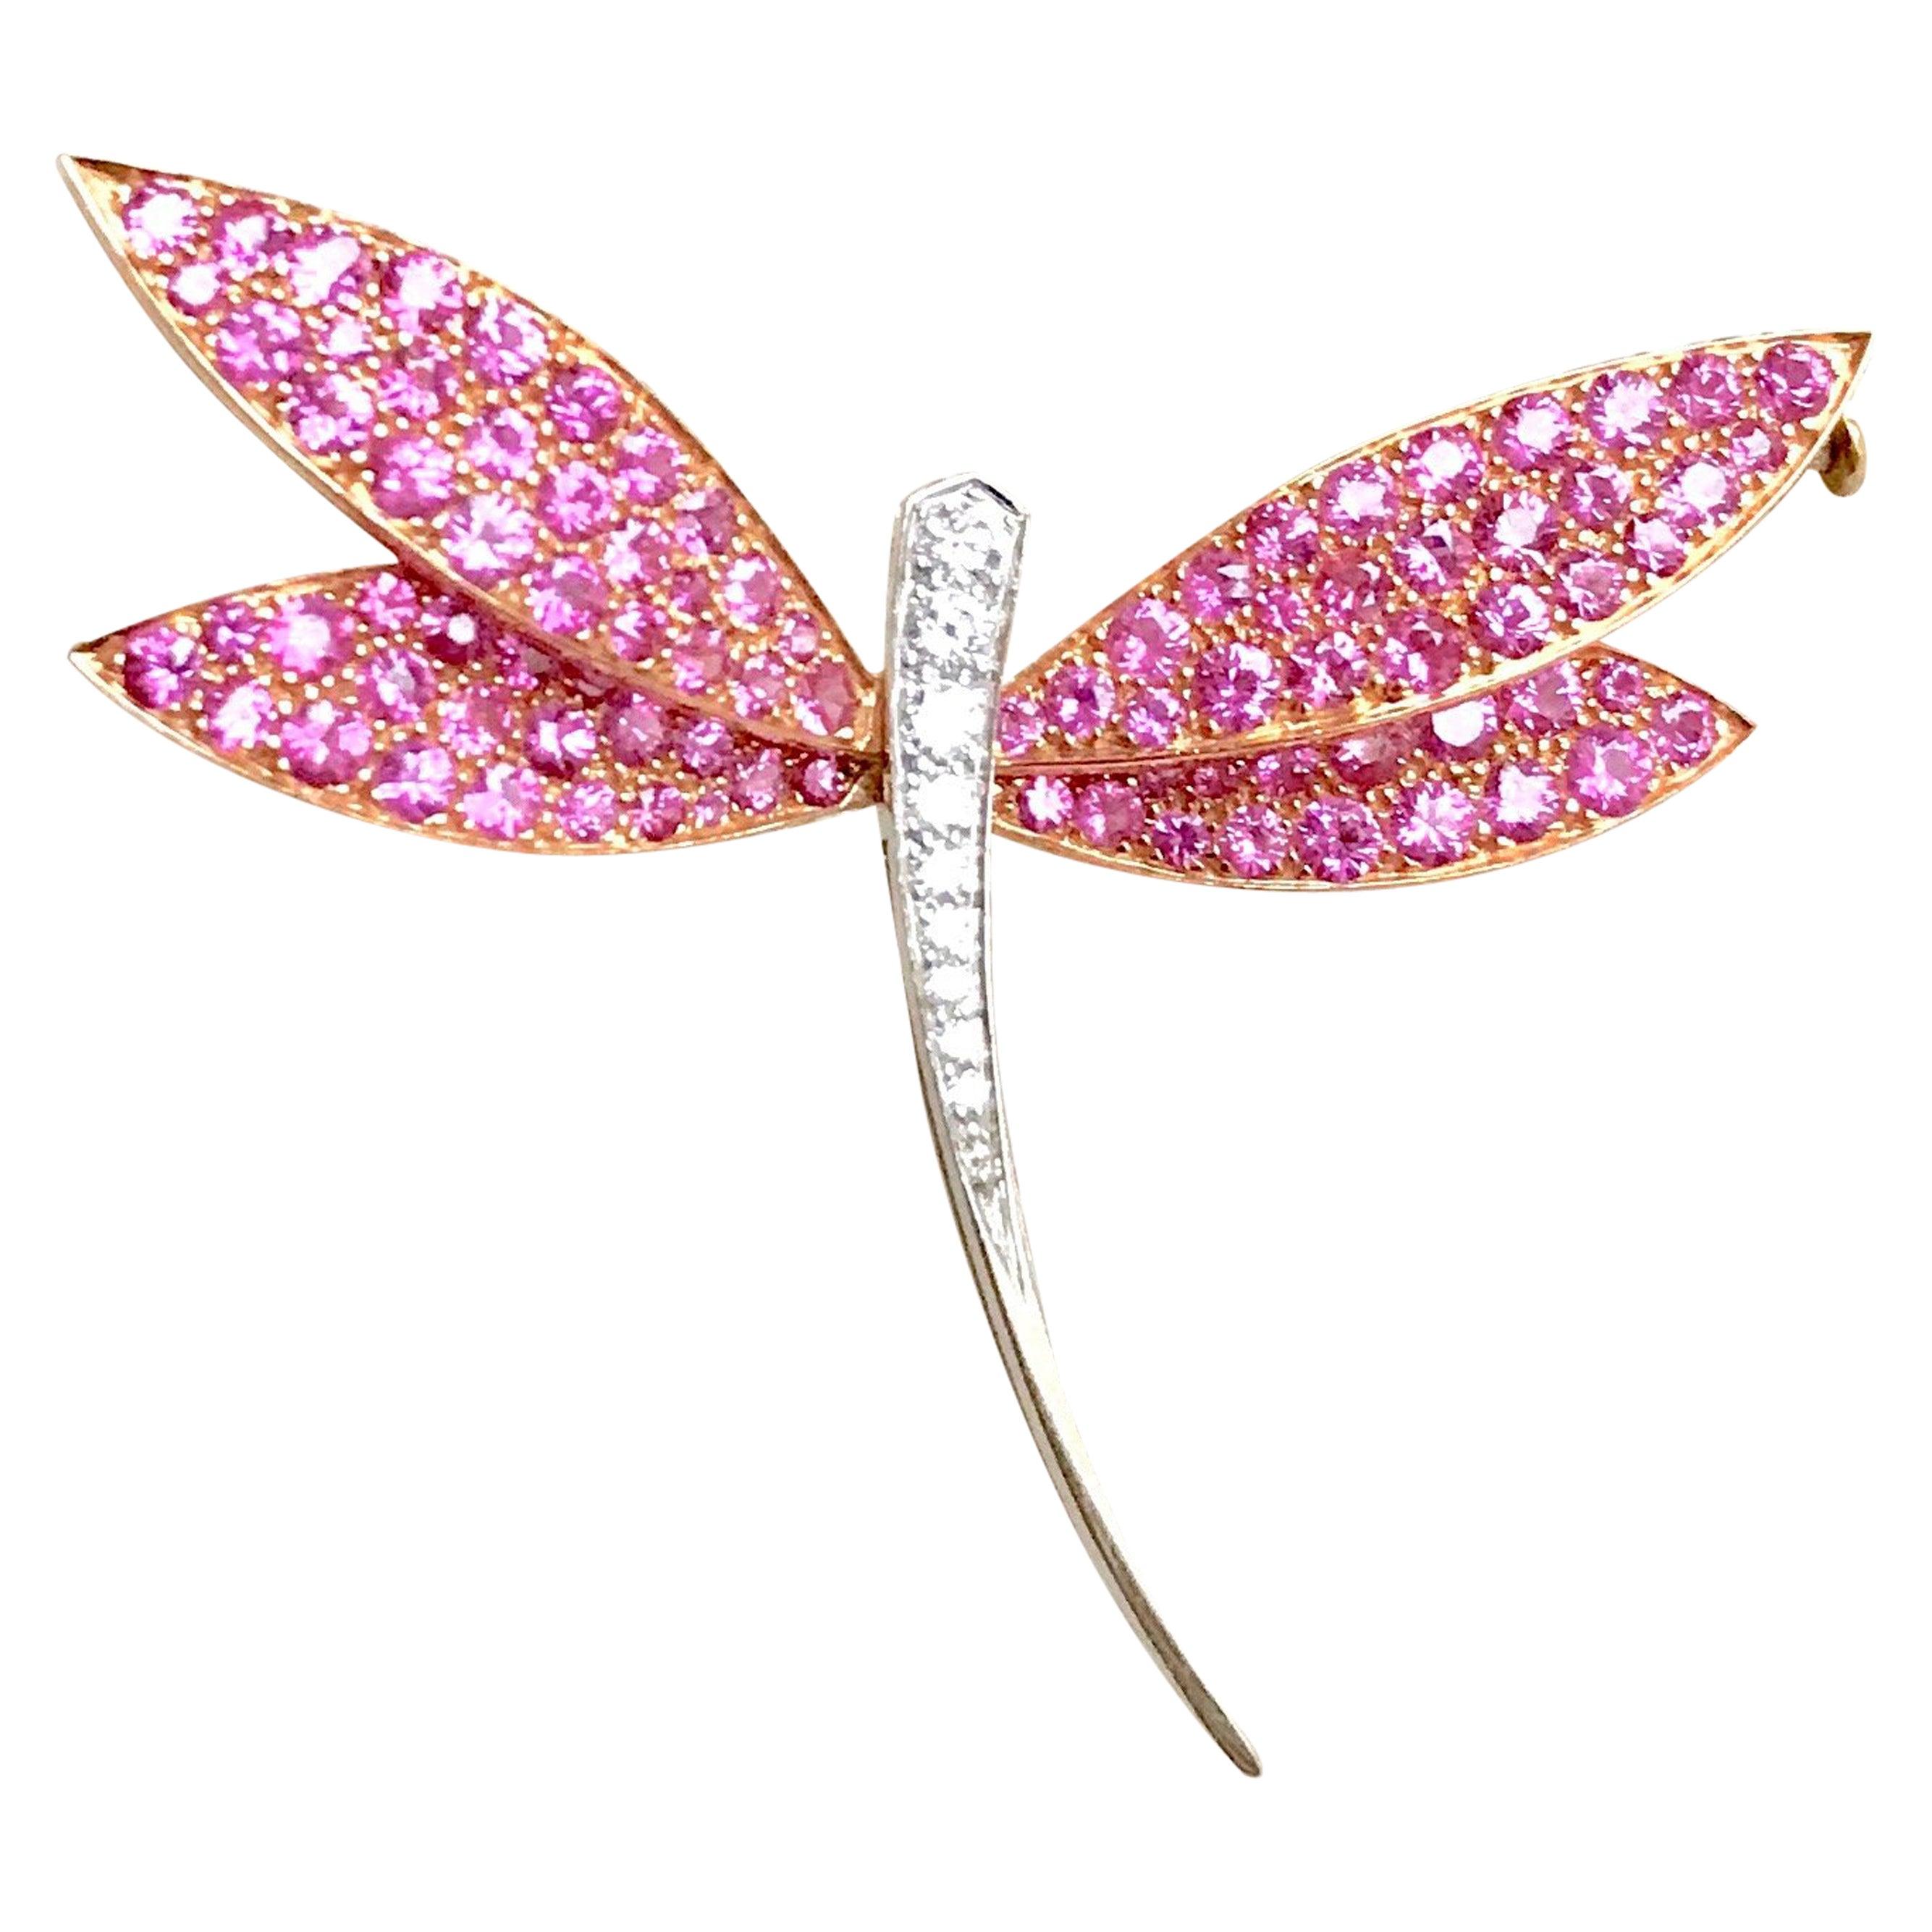 Van Cleef & Arpels Gold Dragonfly Brooch, Pink Sapphires Diamonds